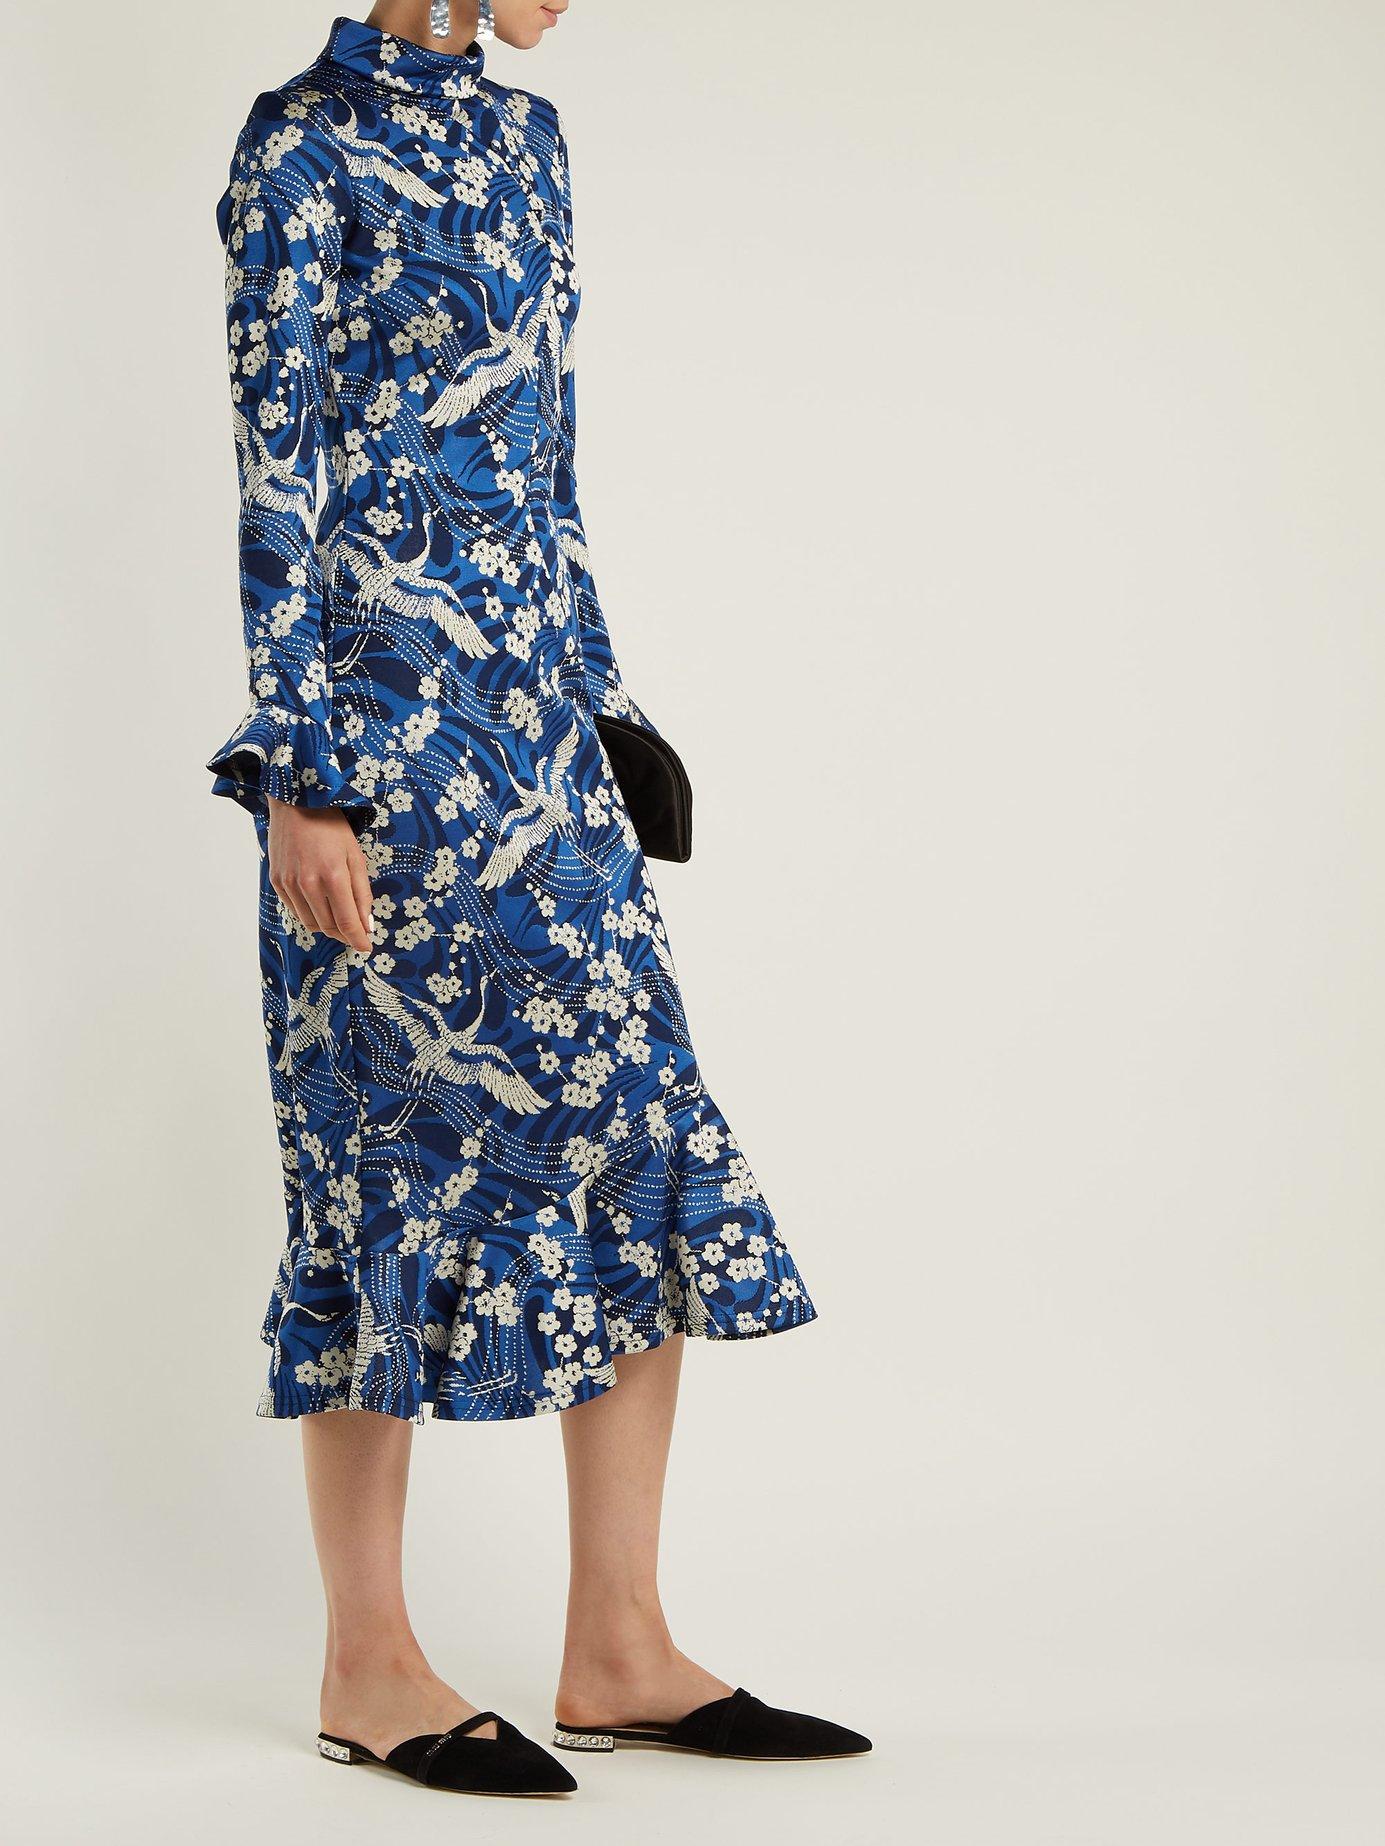 Alta Japanese floral-print jersey dress by Erdem